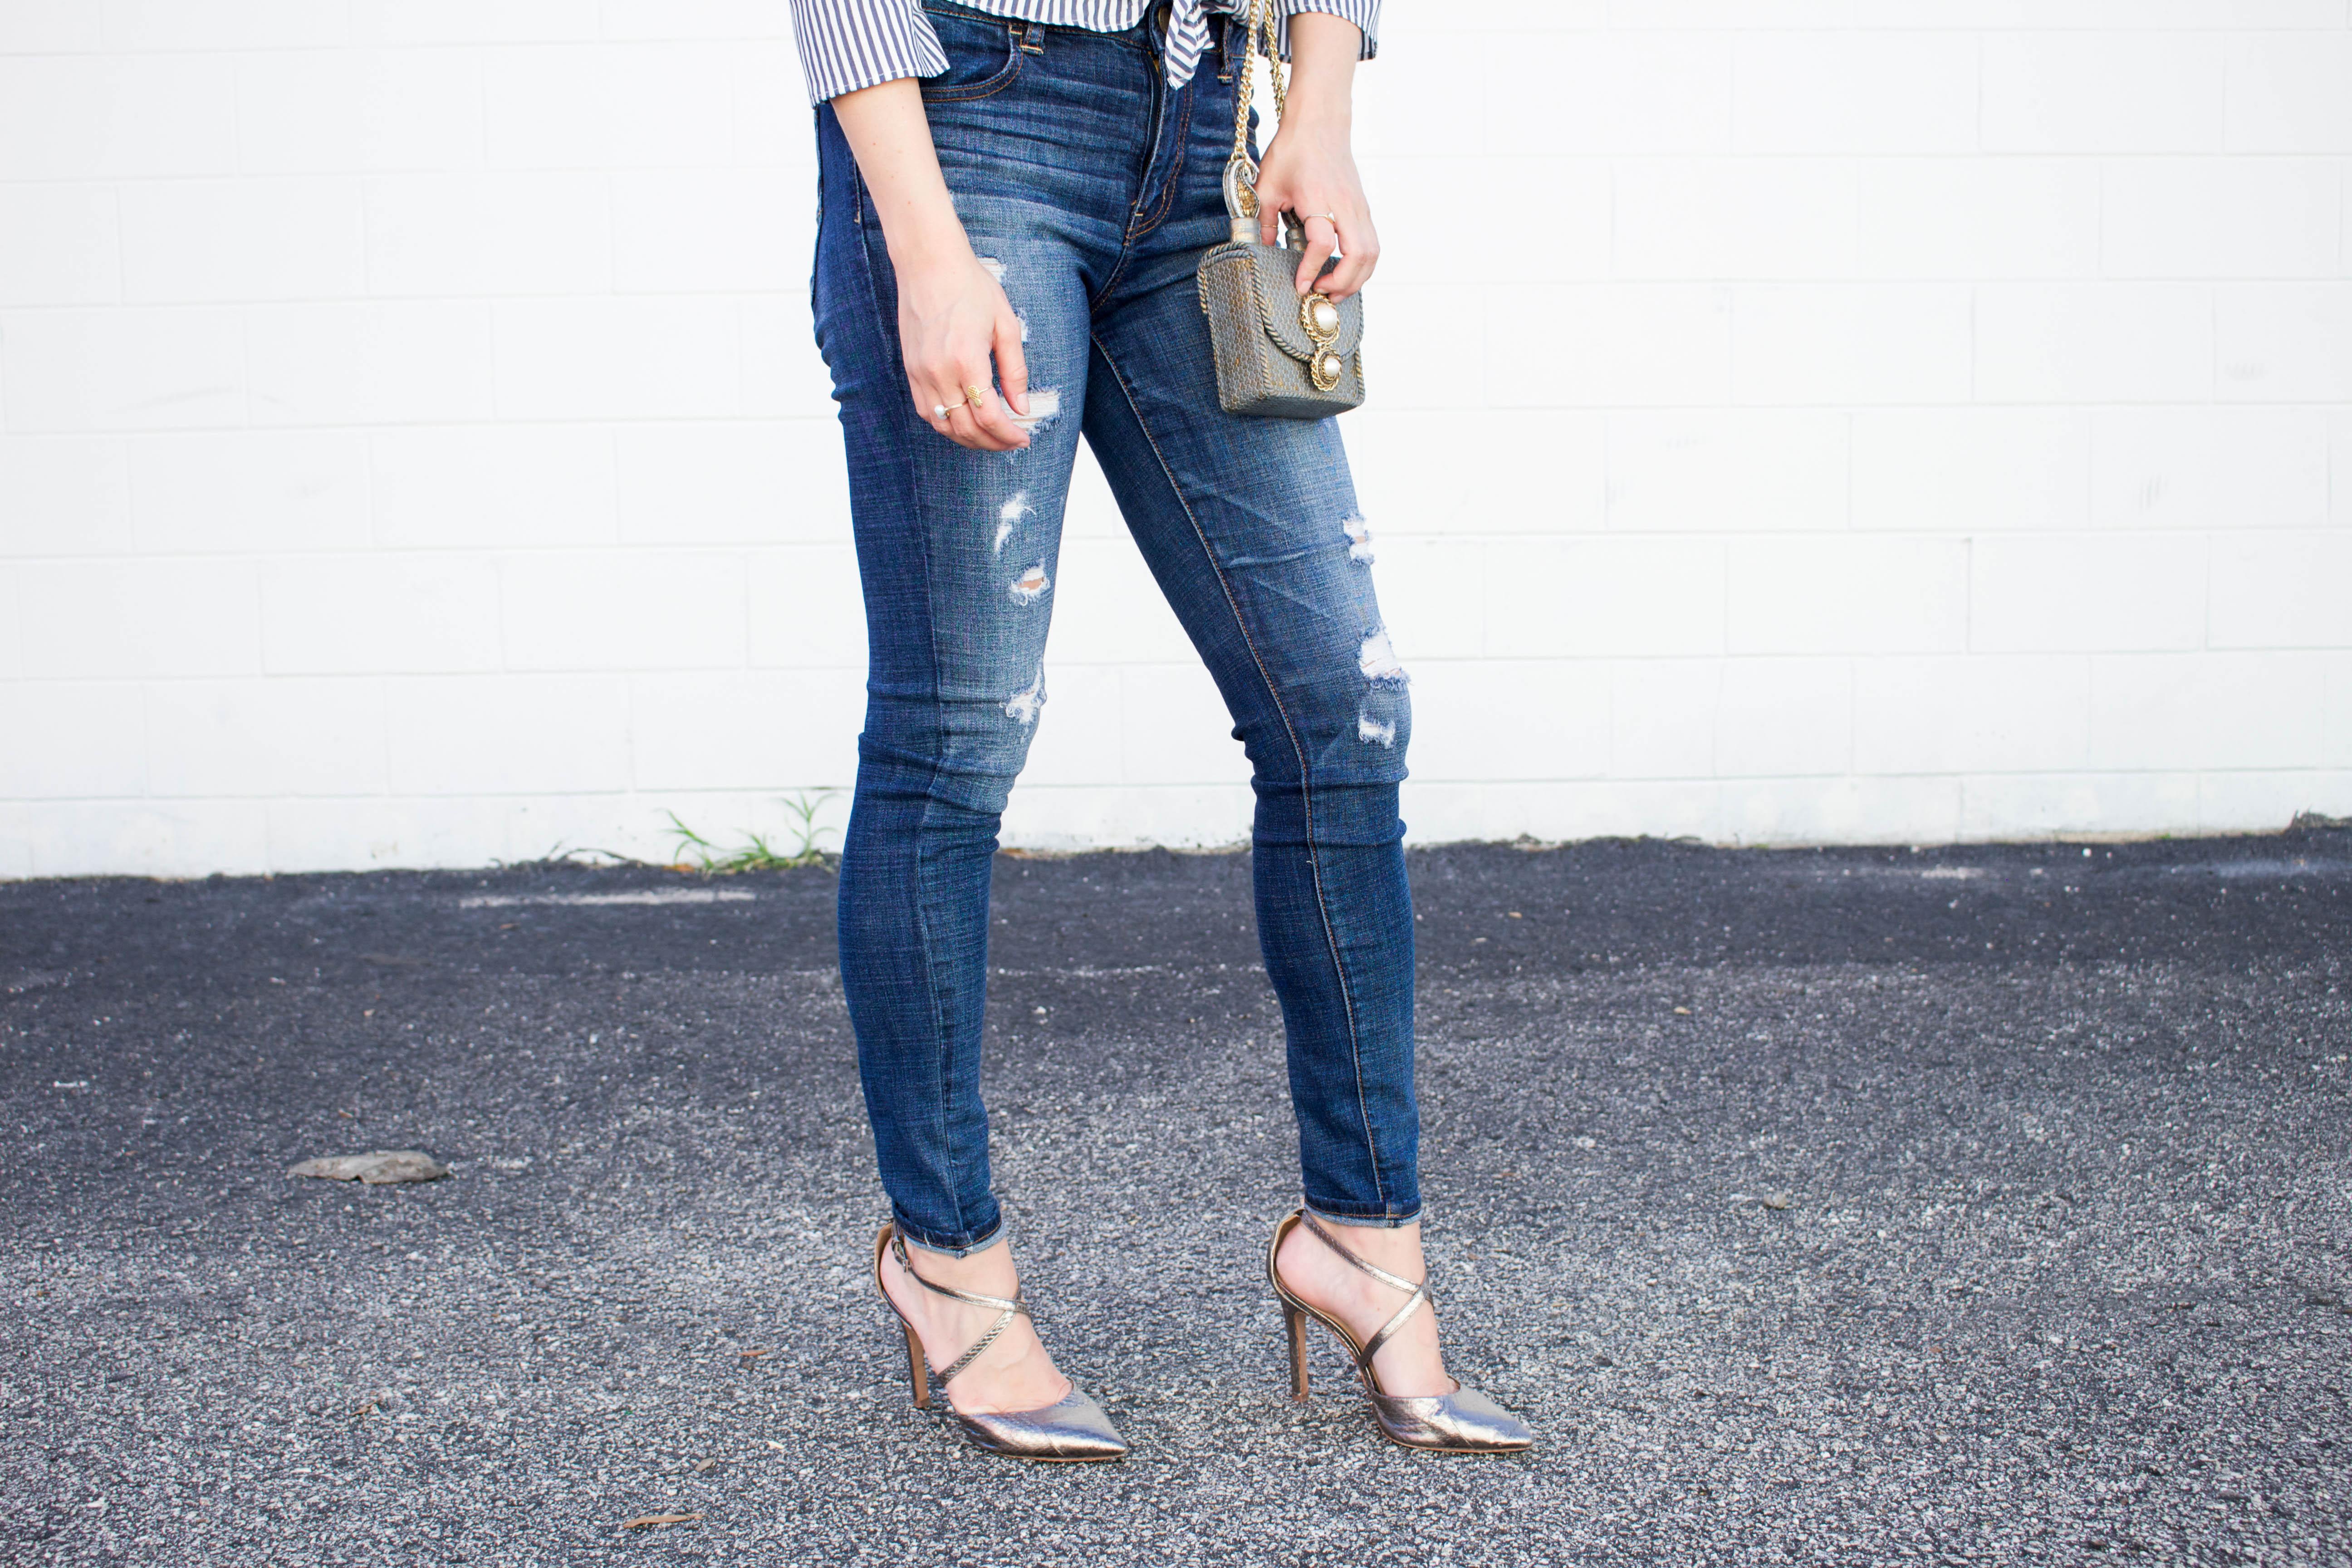 Metallic_Silver_Heels_American_Eagle_Jeans